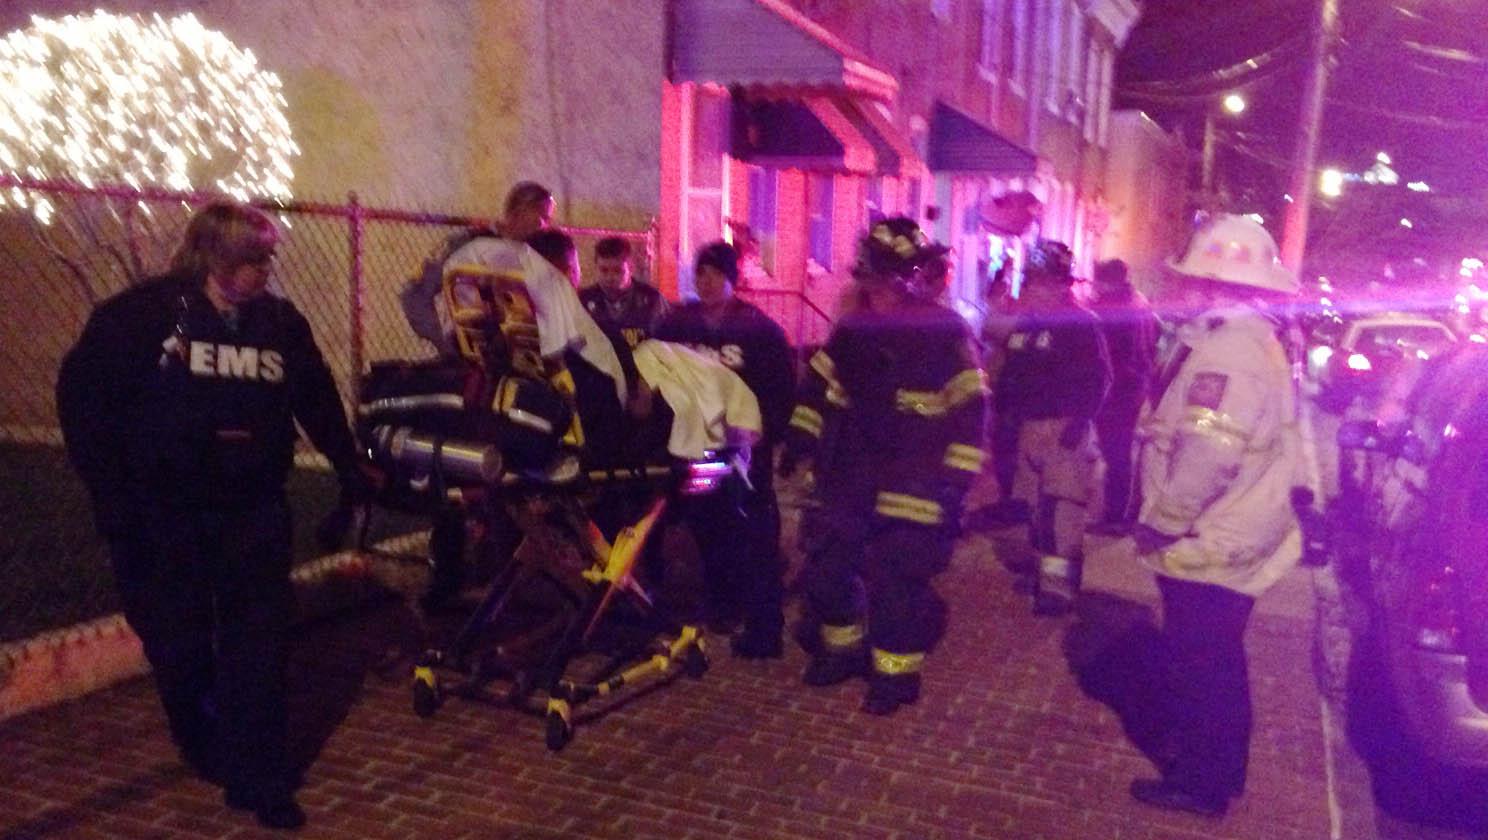 Shooting scene on Brown Street in Wilmington. (Photo: Delaware Free News)